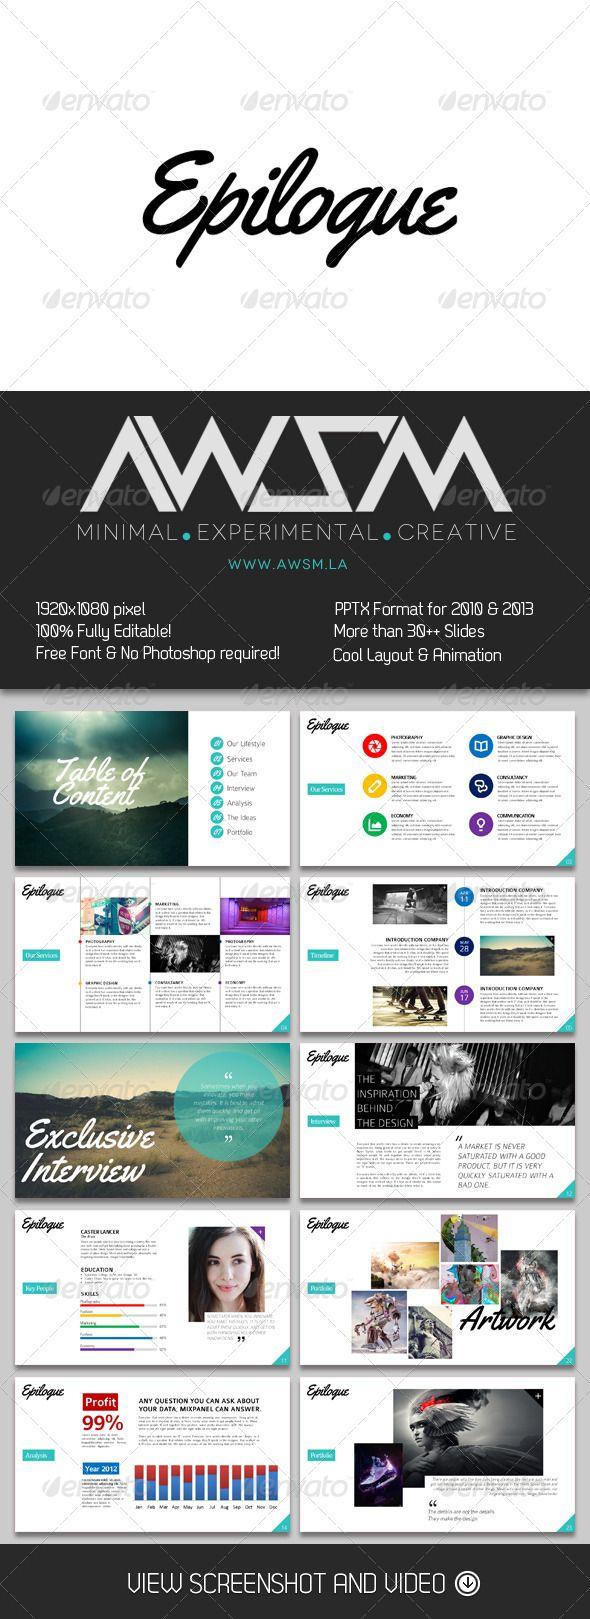 GraphicRiver Epilogue PowerPoint Presentation 6581042